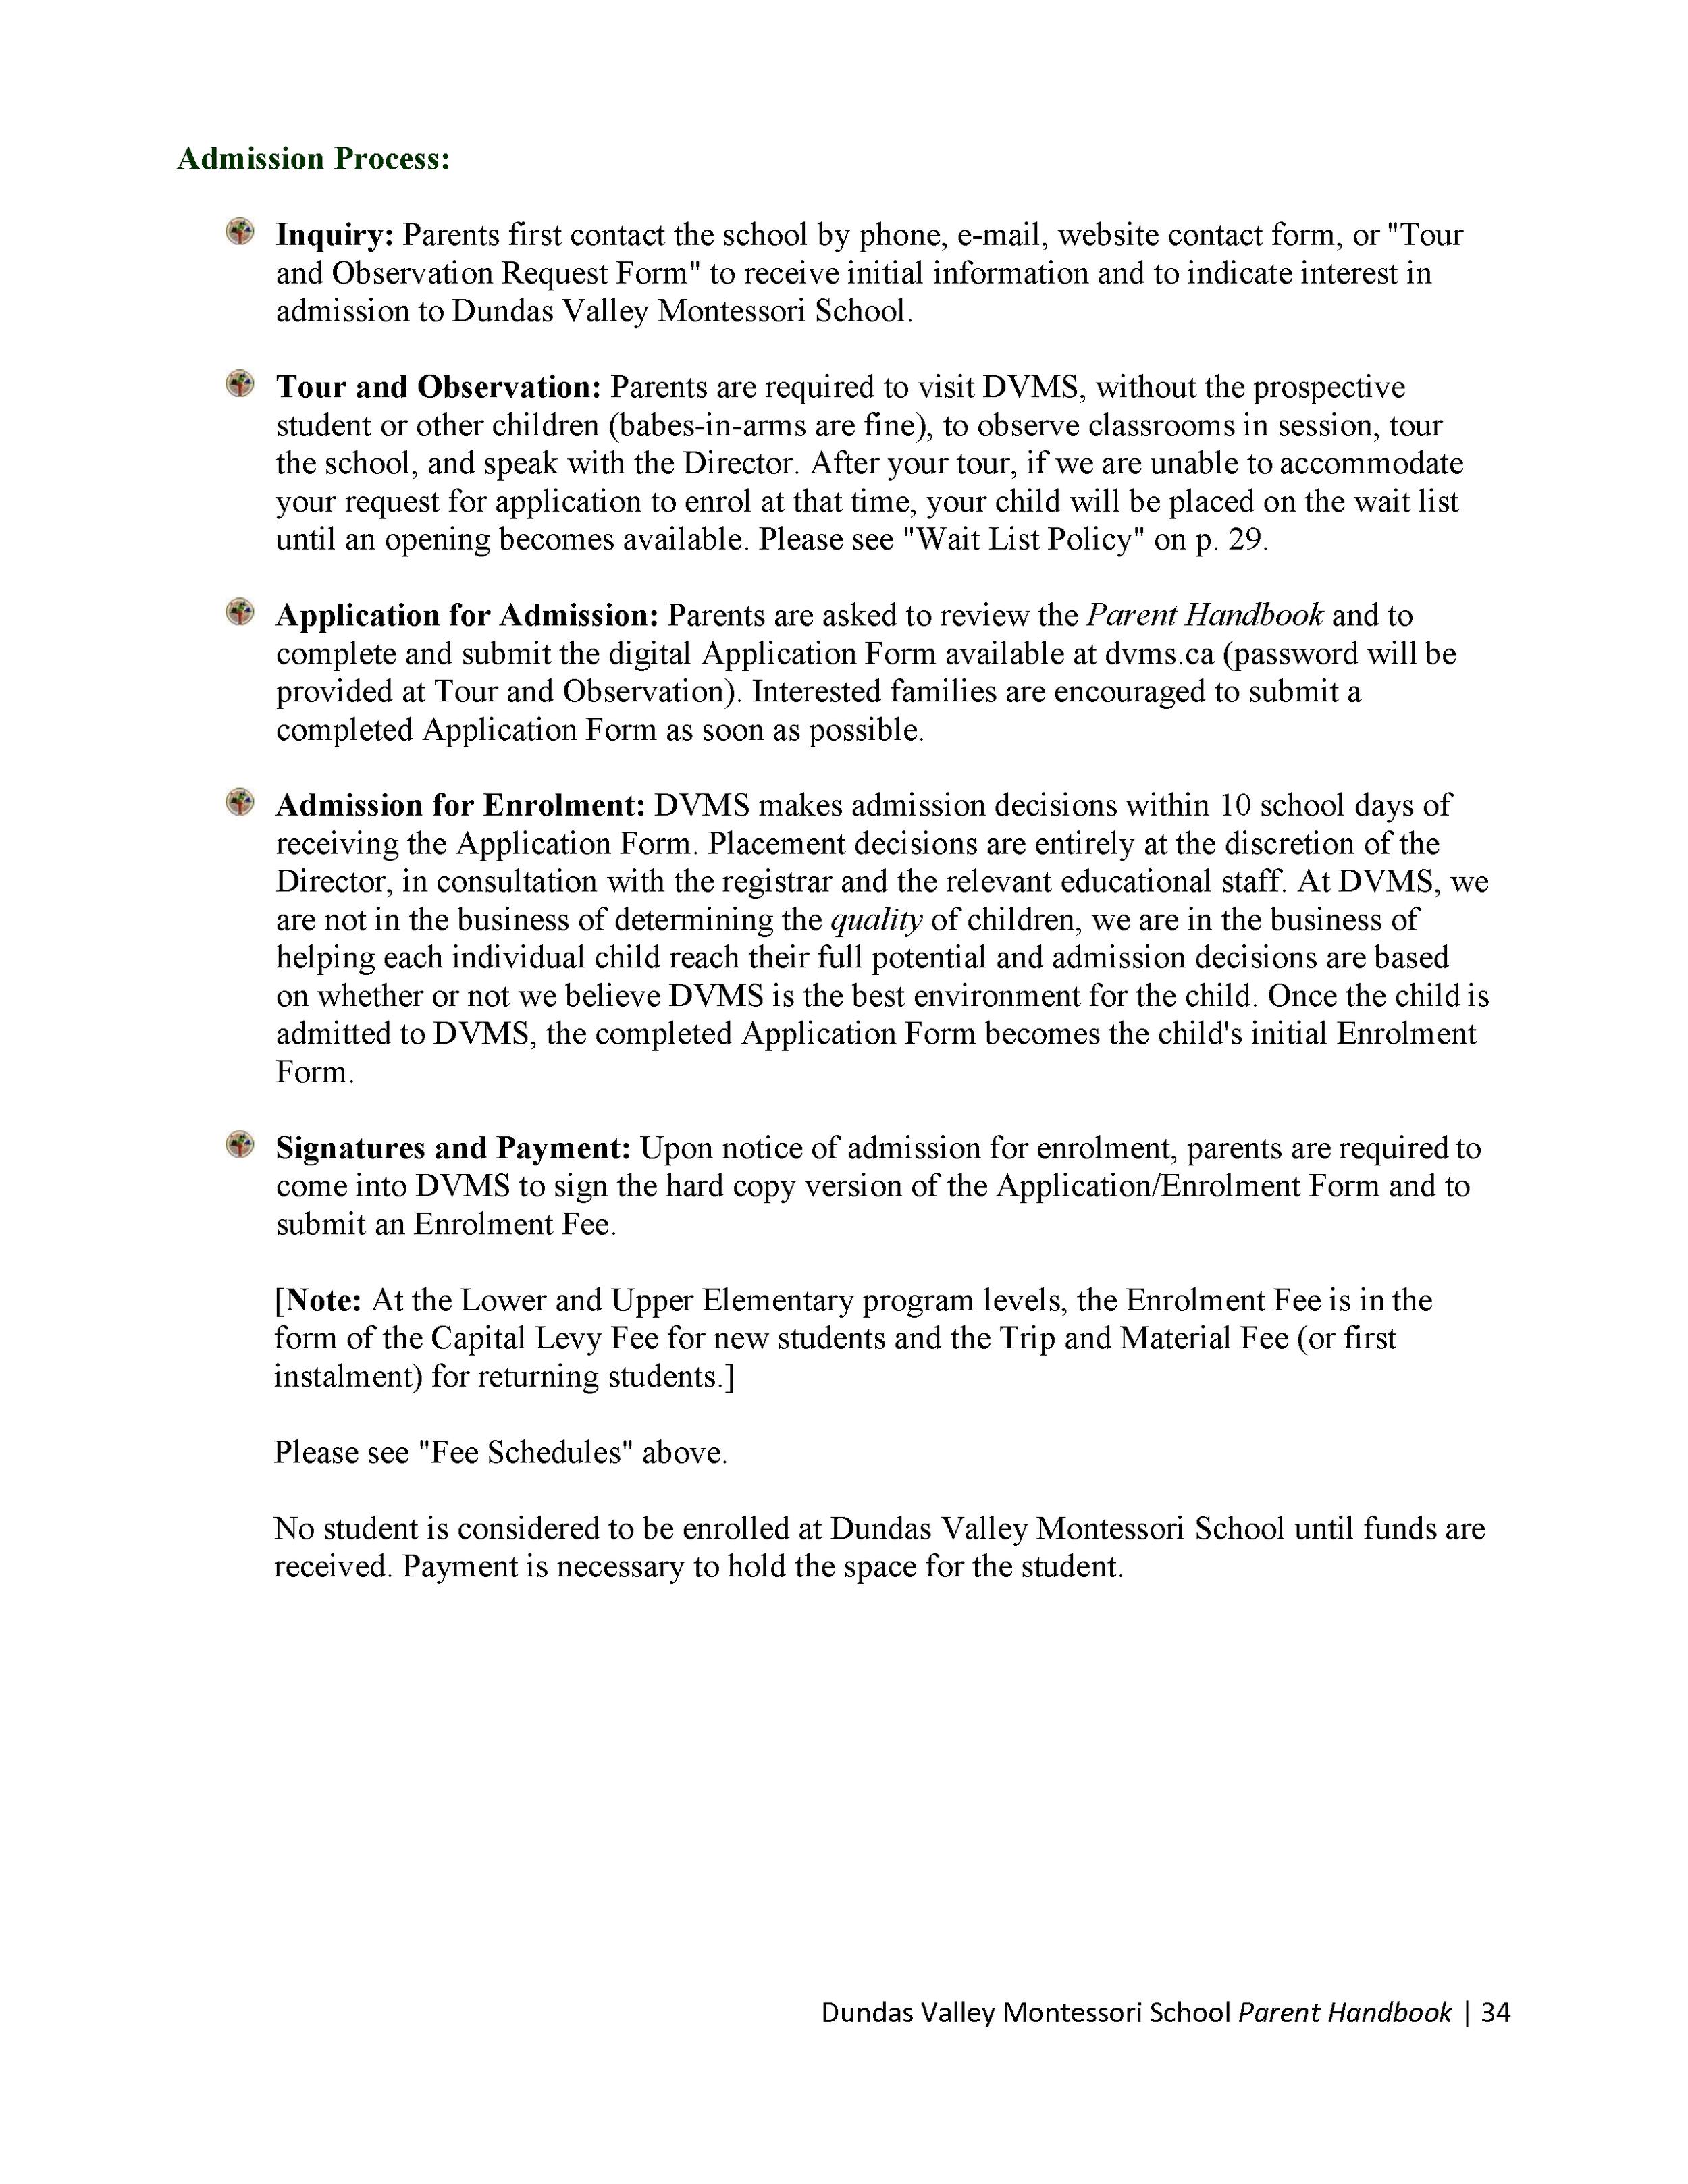 DVMS-Parent-Handbook-19-20_Page_036.png